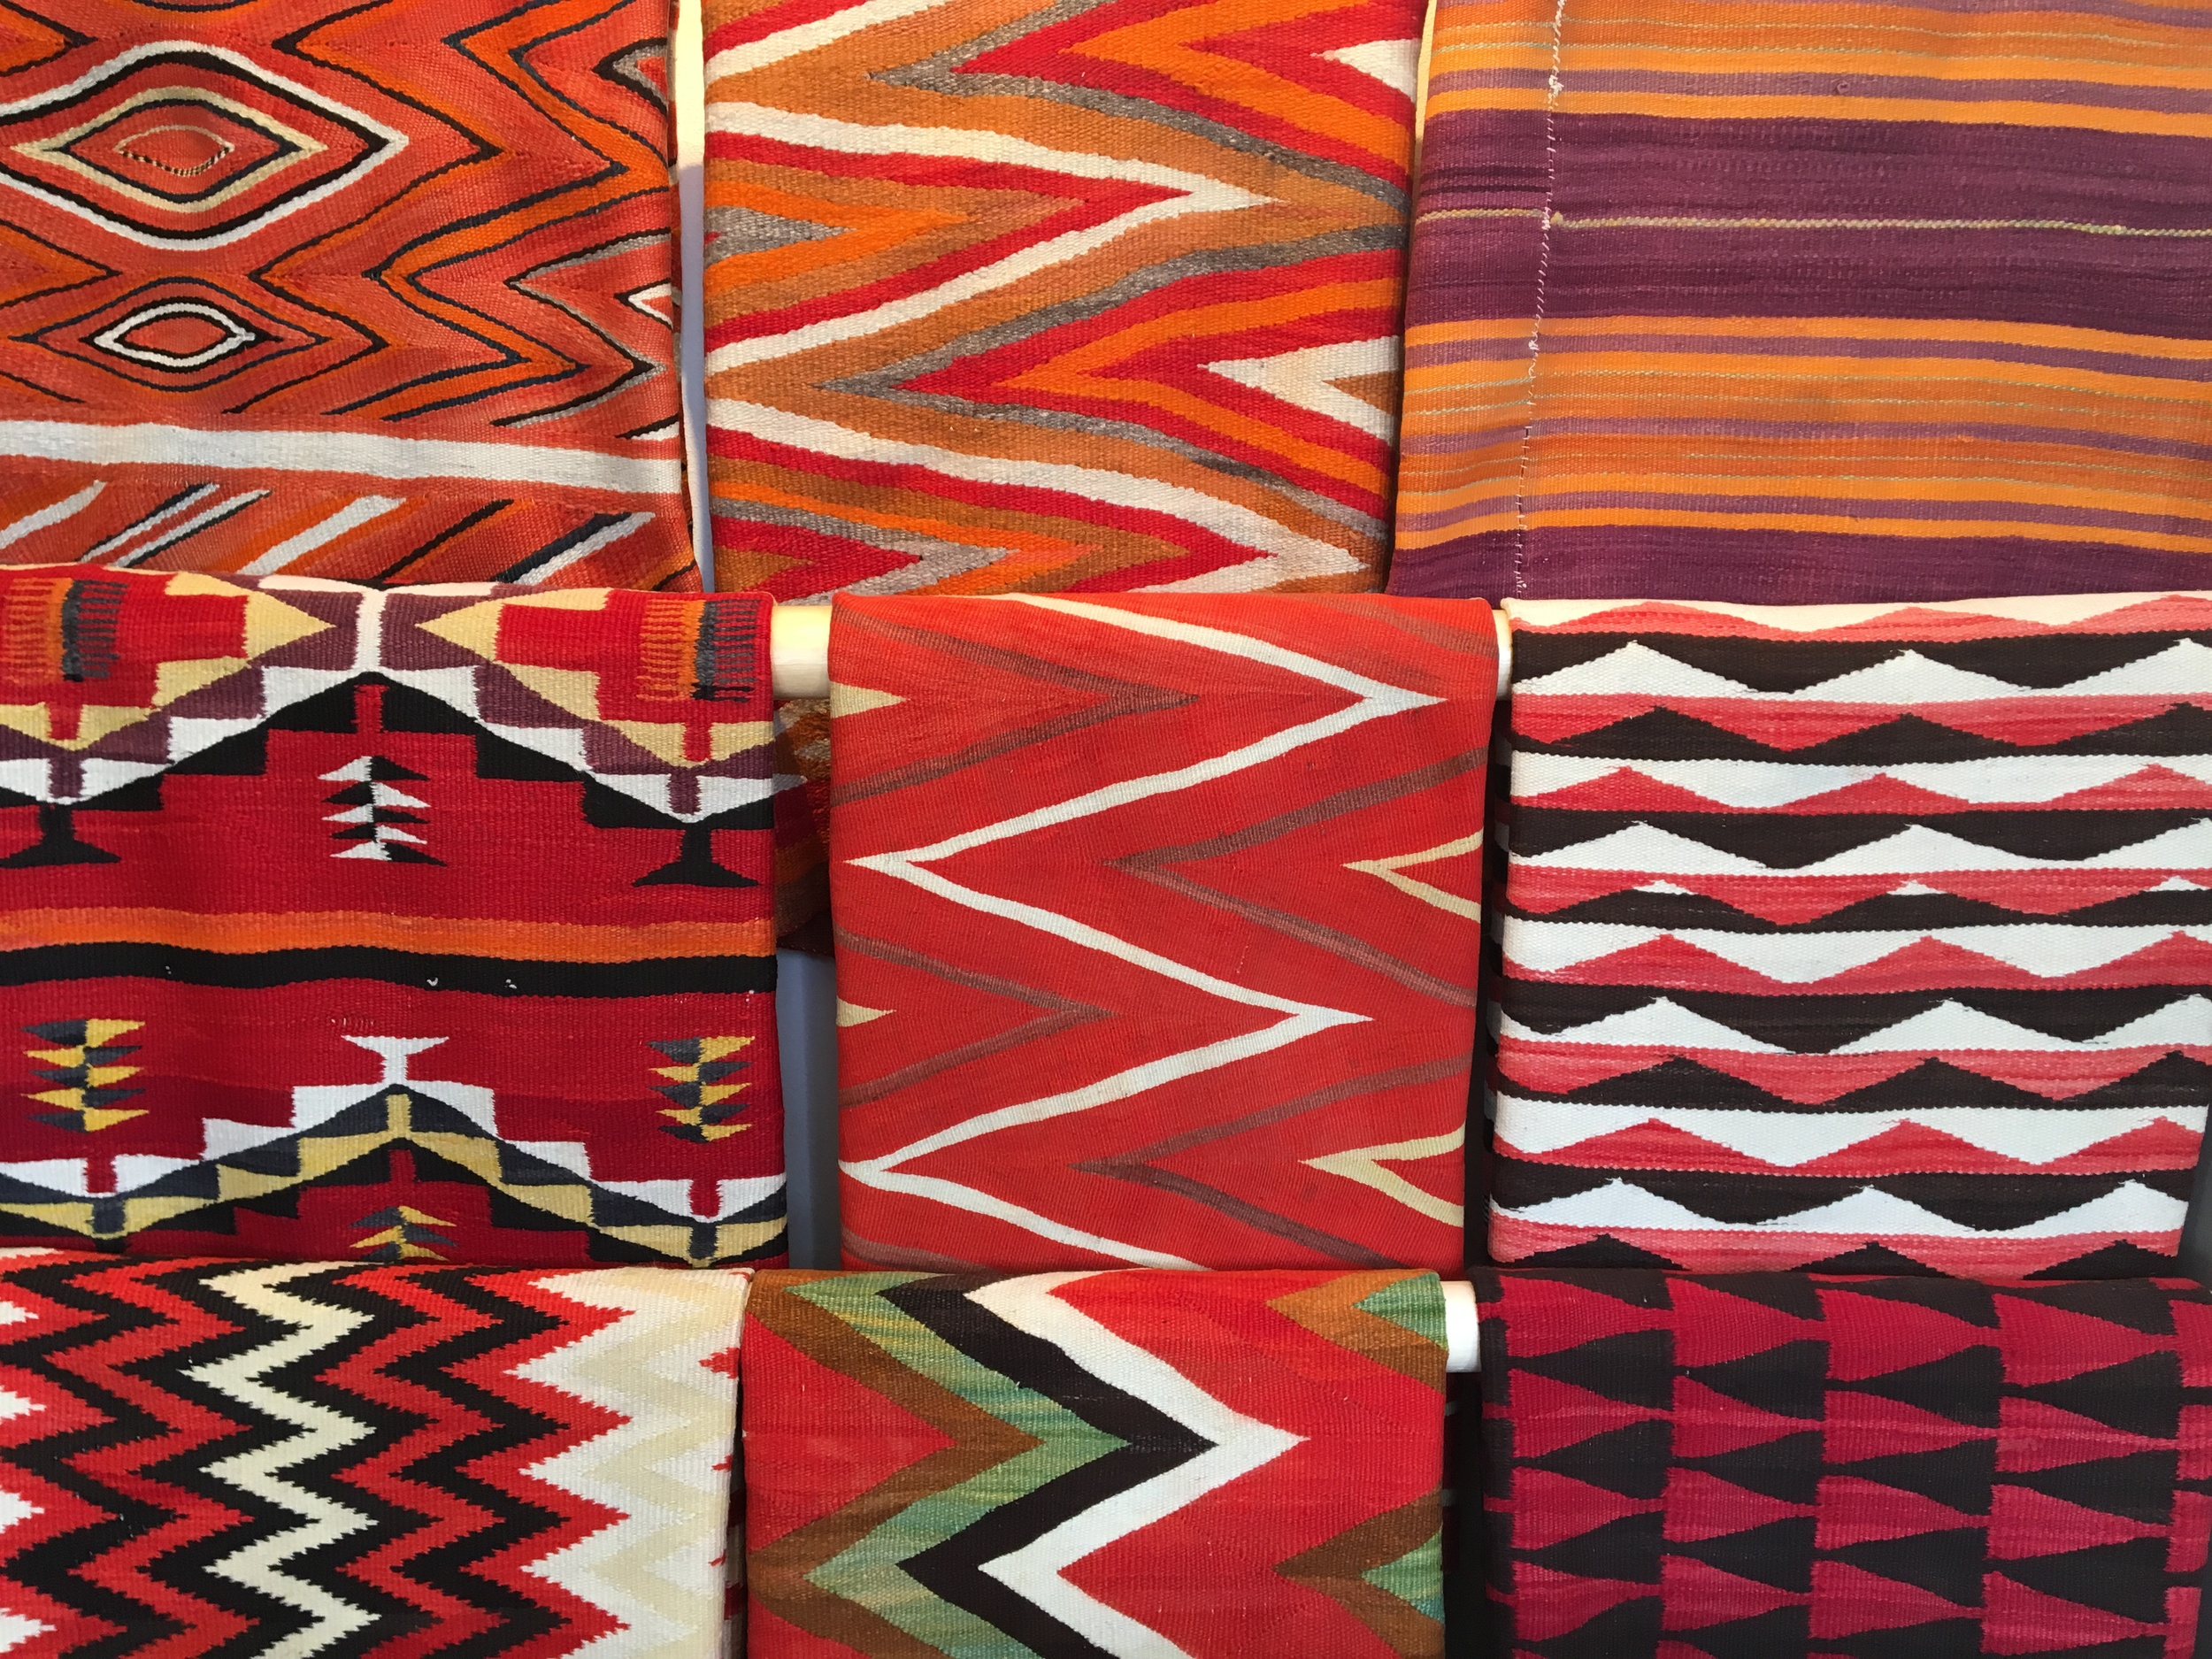 More blankets. Shiprock, Santa Fe